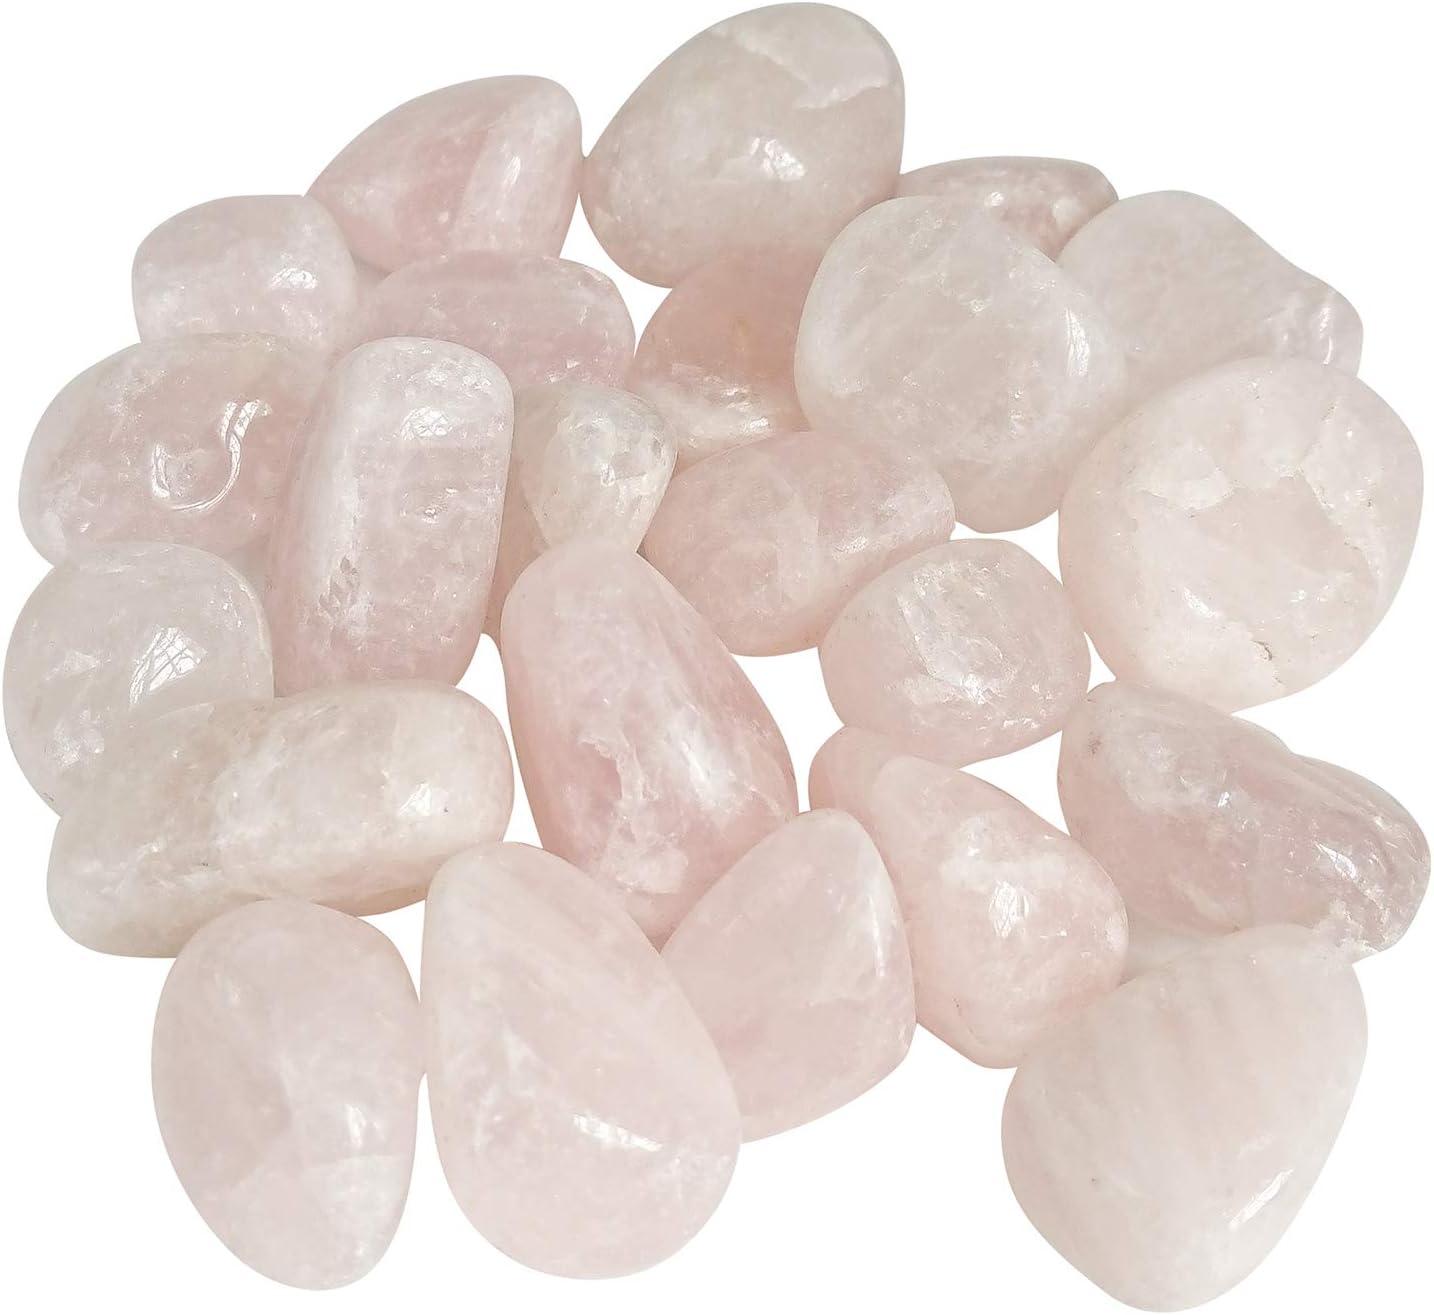 Hulless 1.5 Pounds Pink Rose Quartz Stone, Polished Natural Stones for Fish Tank, Flowerpot, Reiki, Healing Crystal